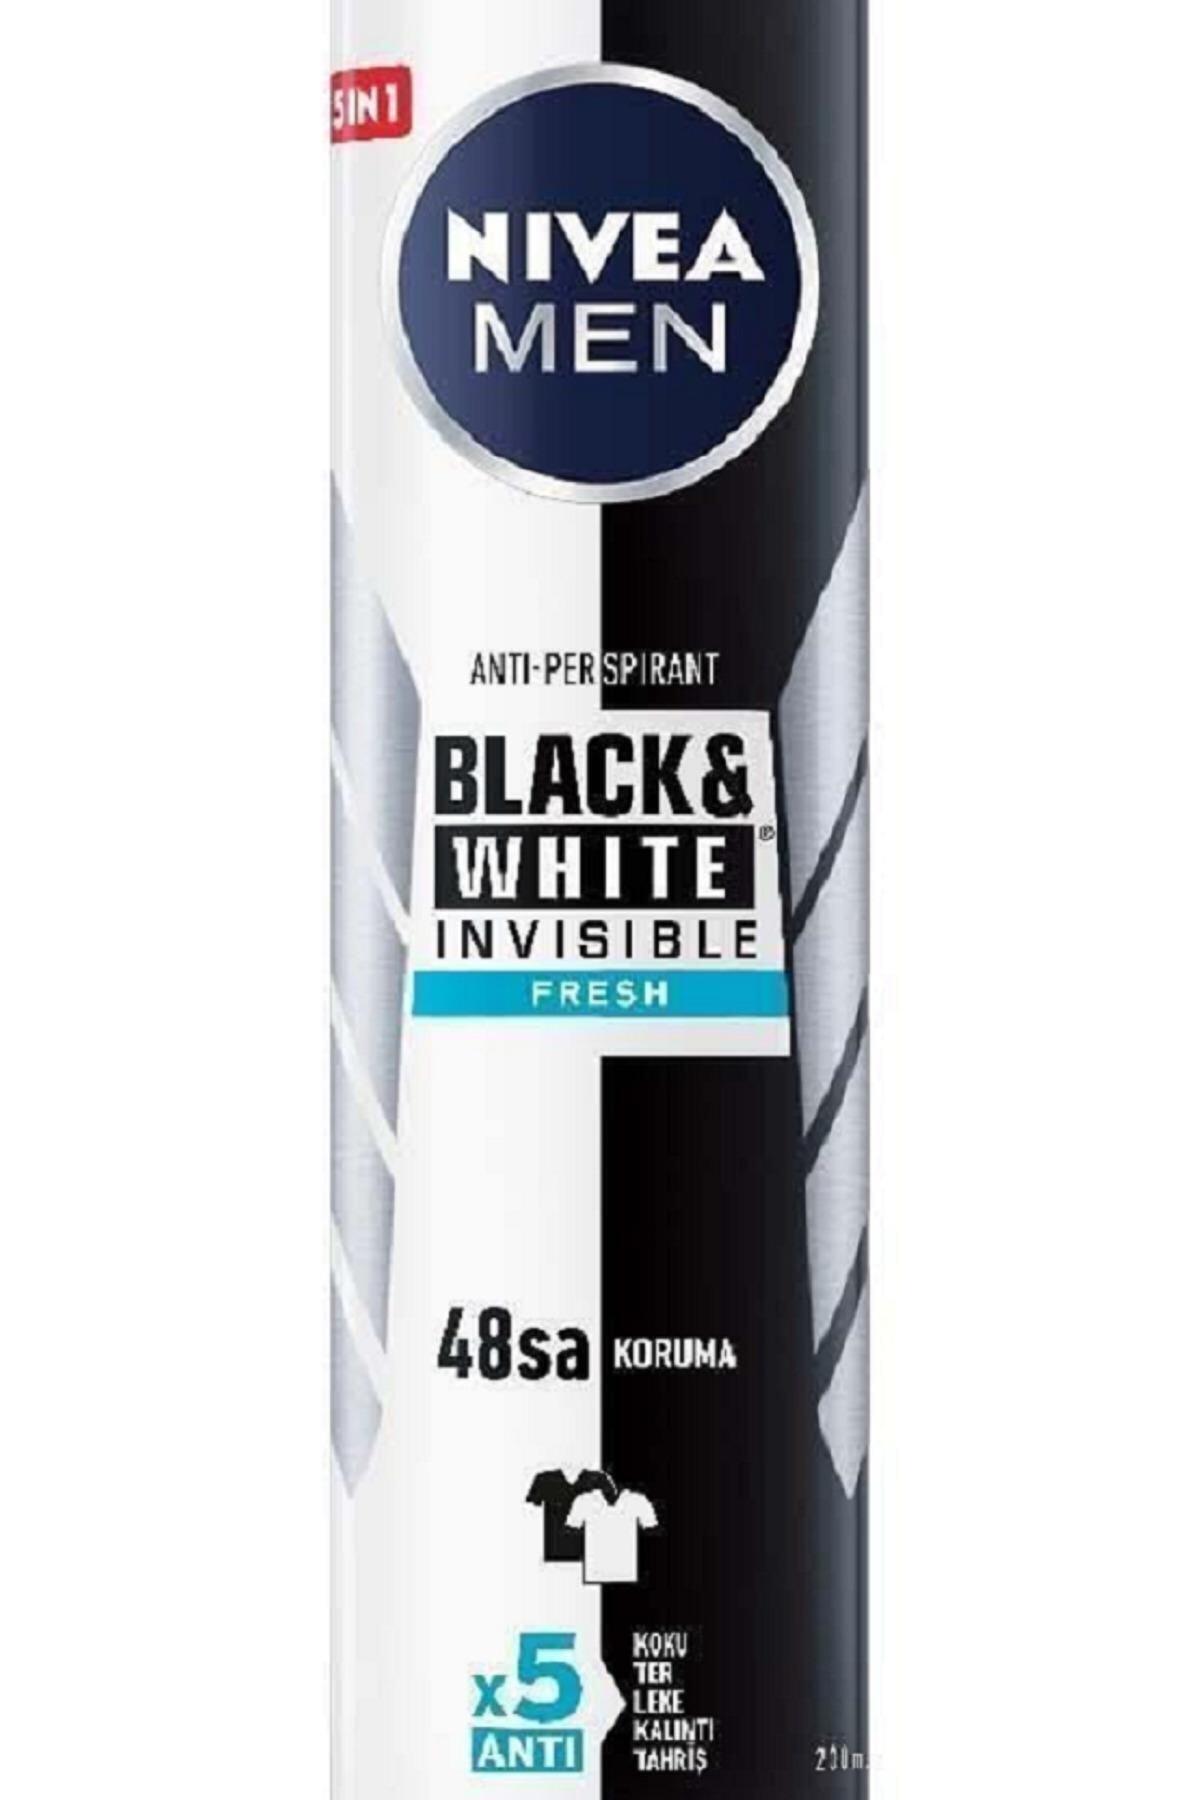 Nivea Men Black & White Invisible Fresh 200 ml Erkek Deodorant 2 Adet 2